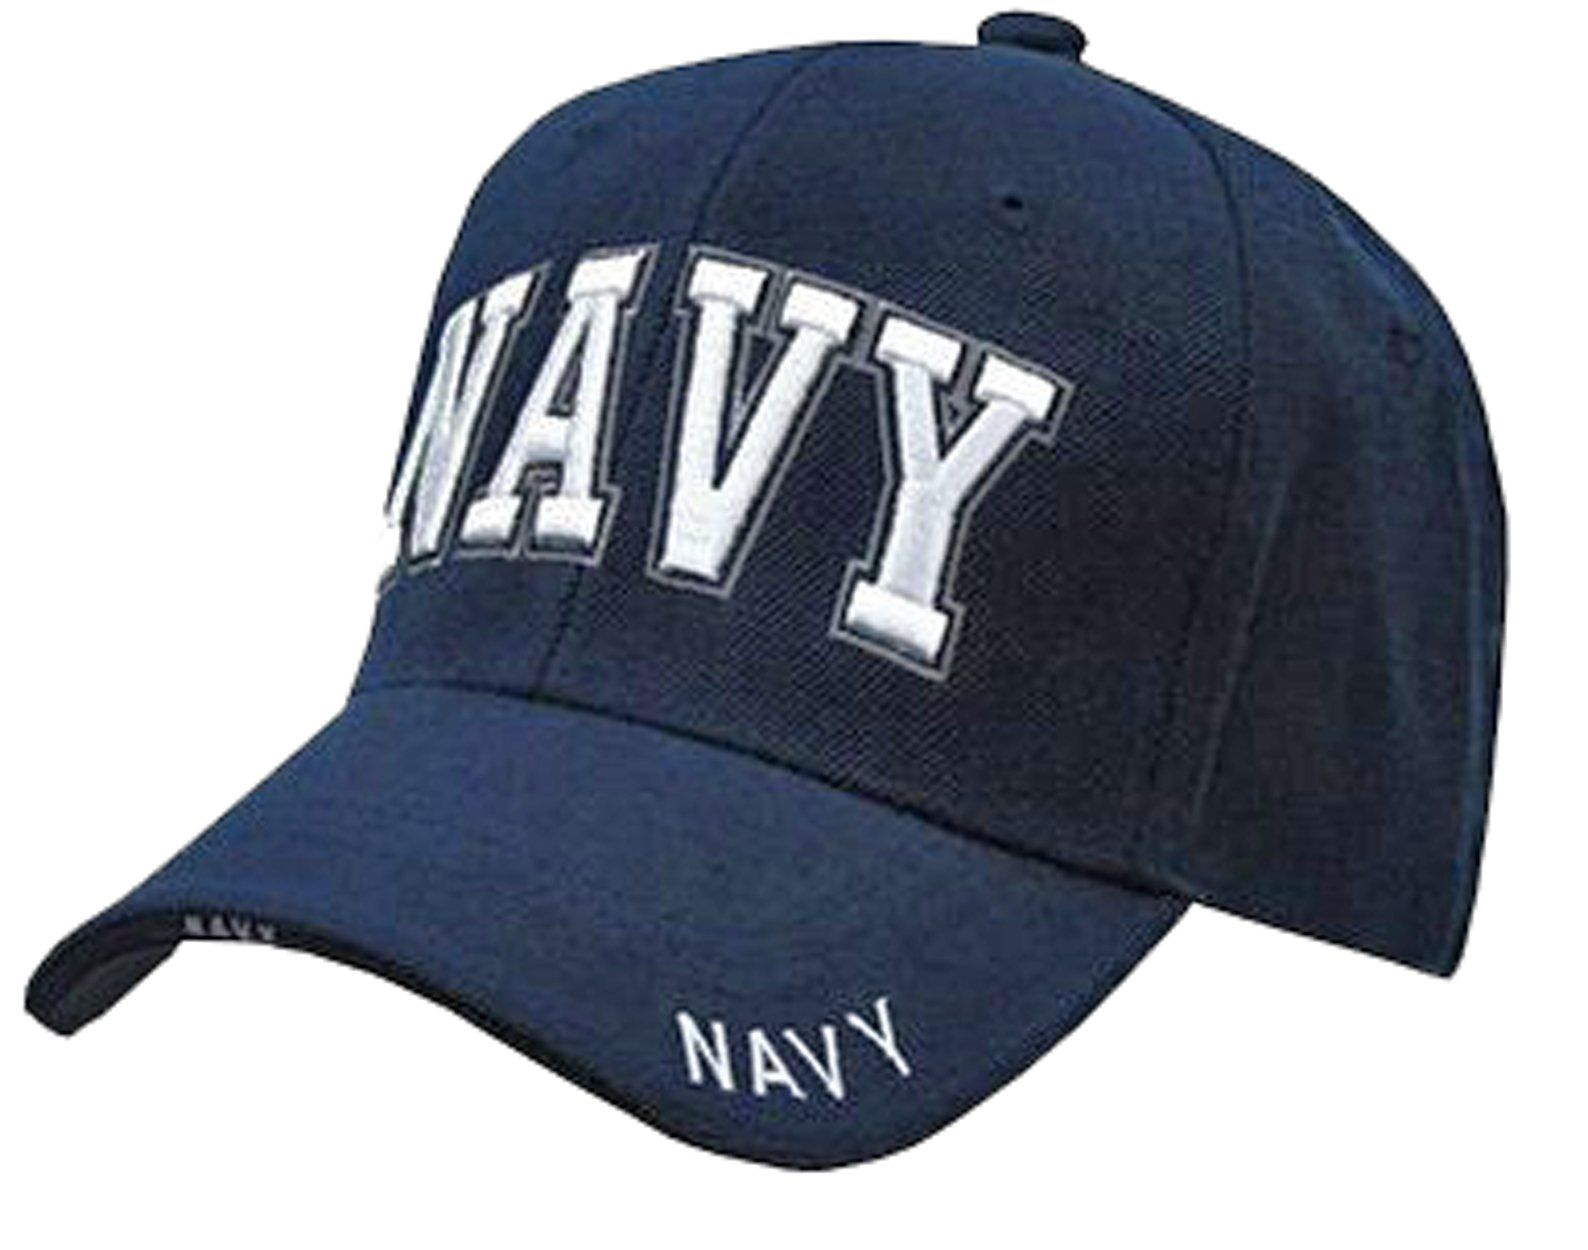 a081fef4c1f2c NAVY Baseball Cap Blue US Military Hat for Men Women